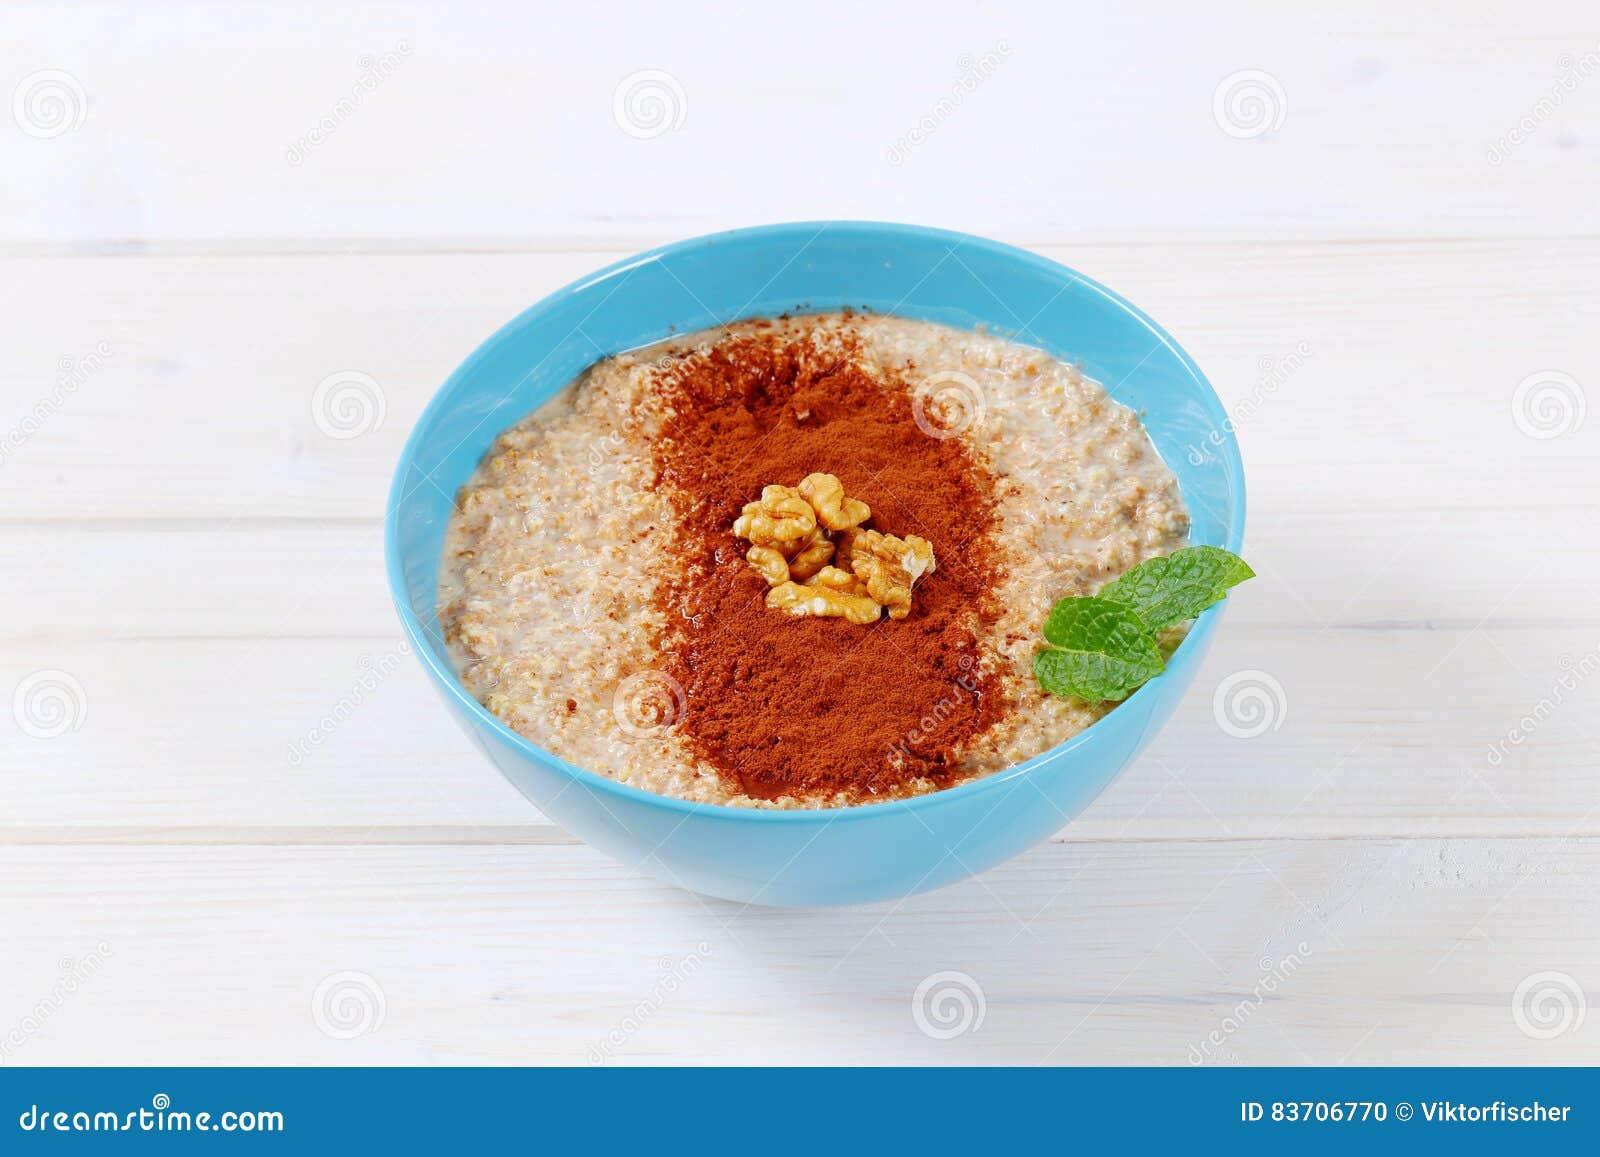 Bowl Of Oatmeal Porridge Stock Photo